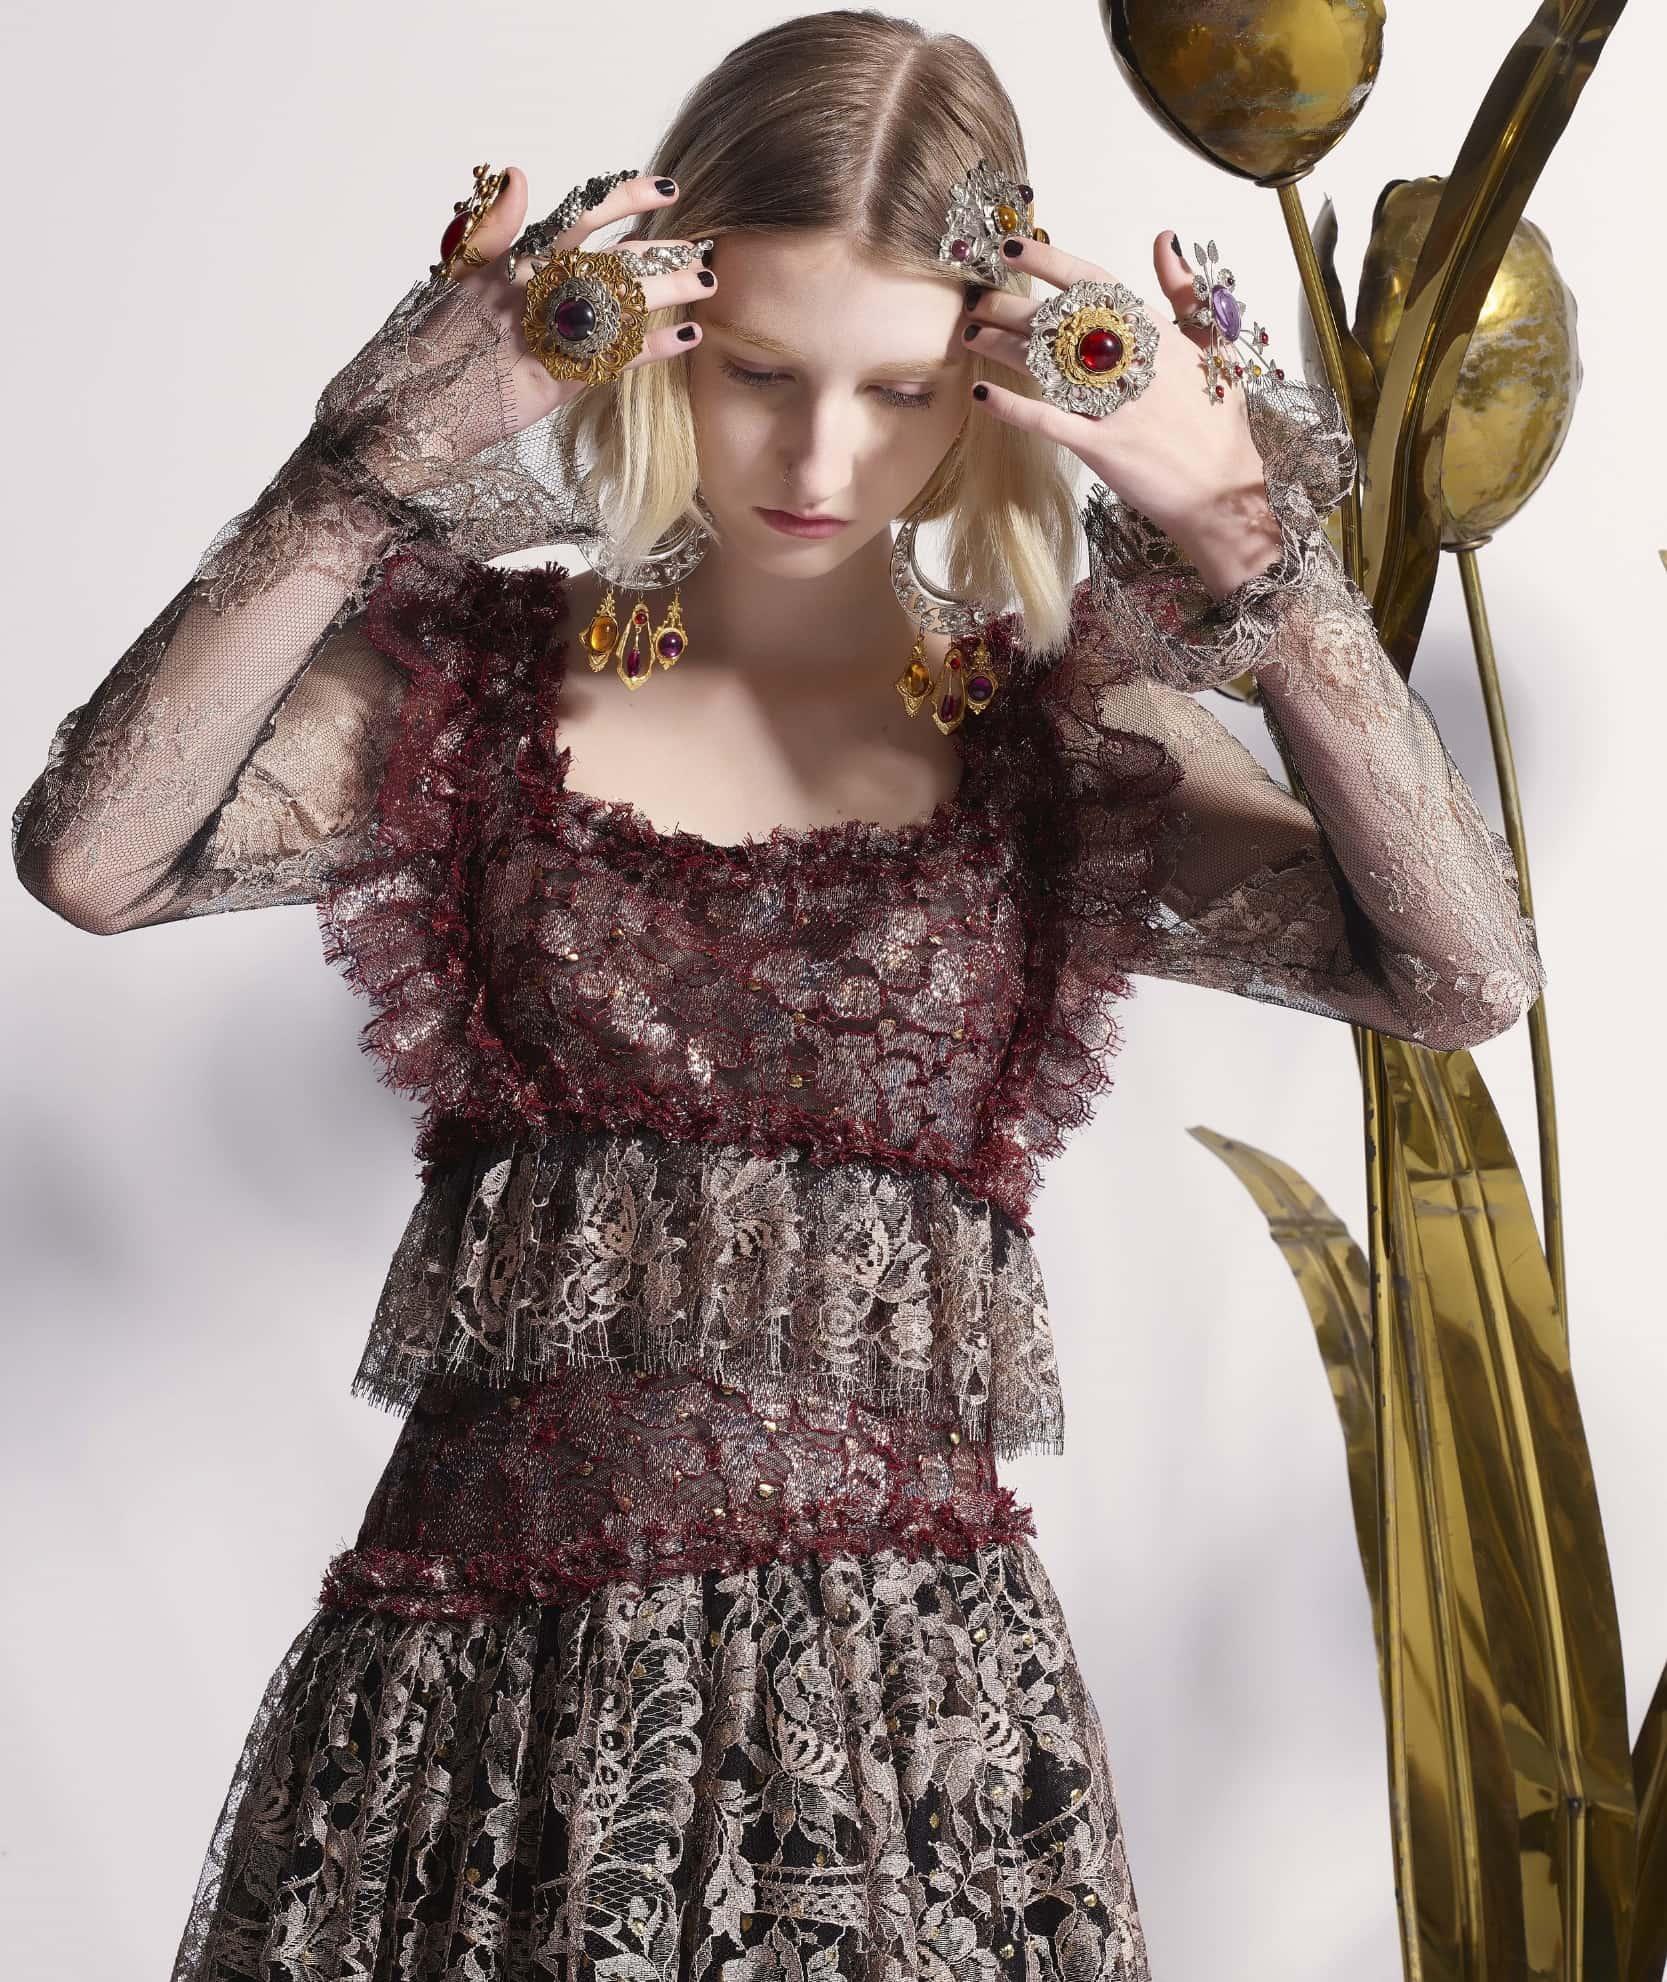 rodarte-autumn-dewilde-runway-magazine-066-final-JB Five new invited members for next Haute Couture Fashion Week in Paris